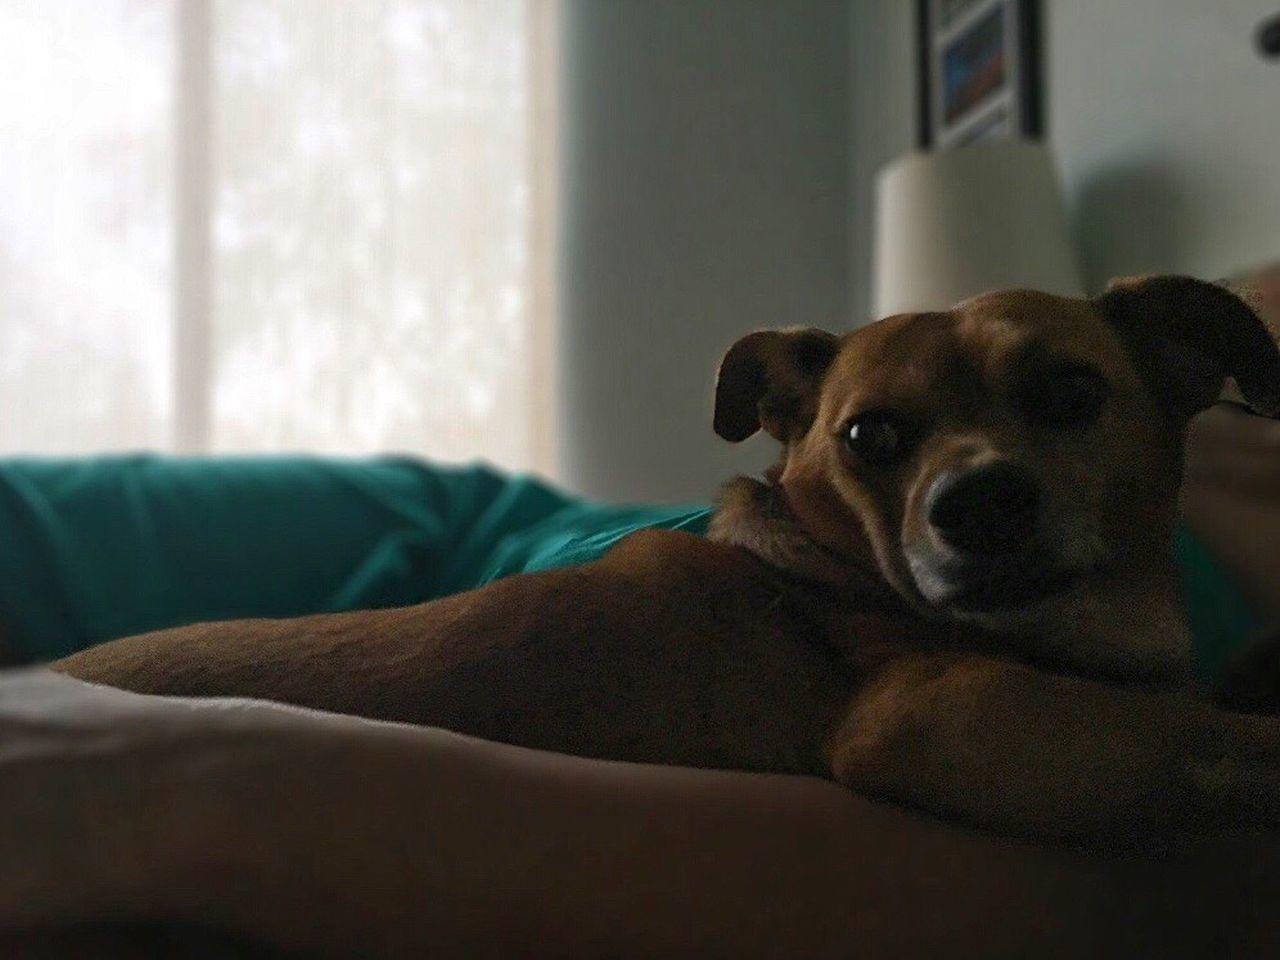 Nap Time Dog Naptime Snugglebuddy Secure